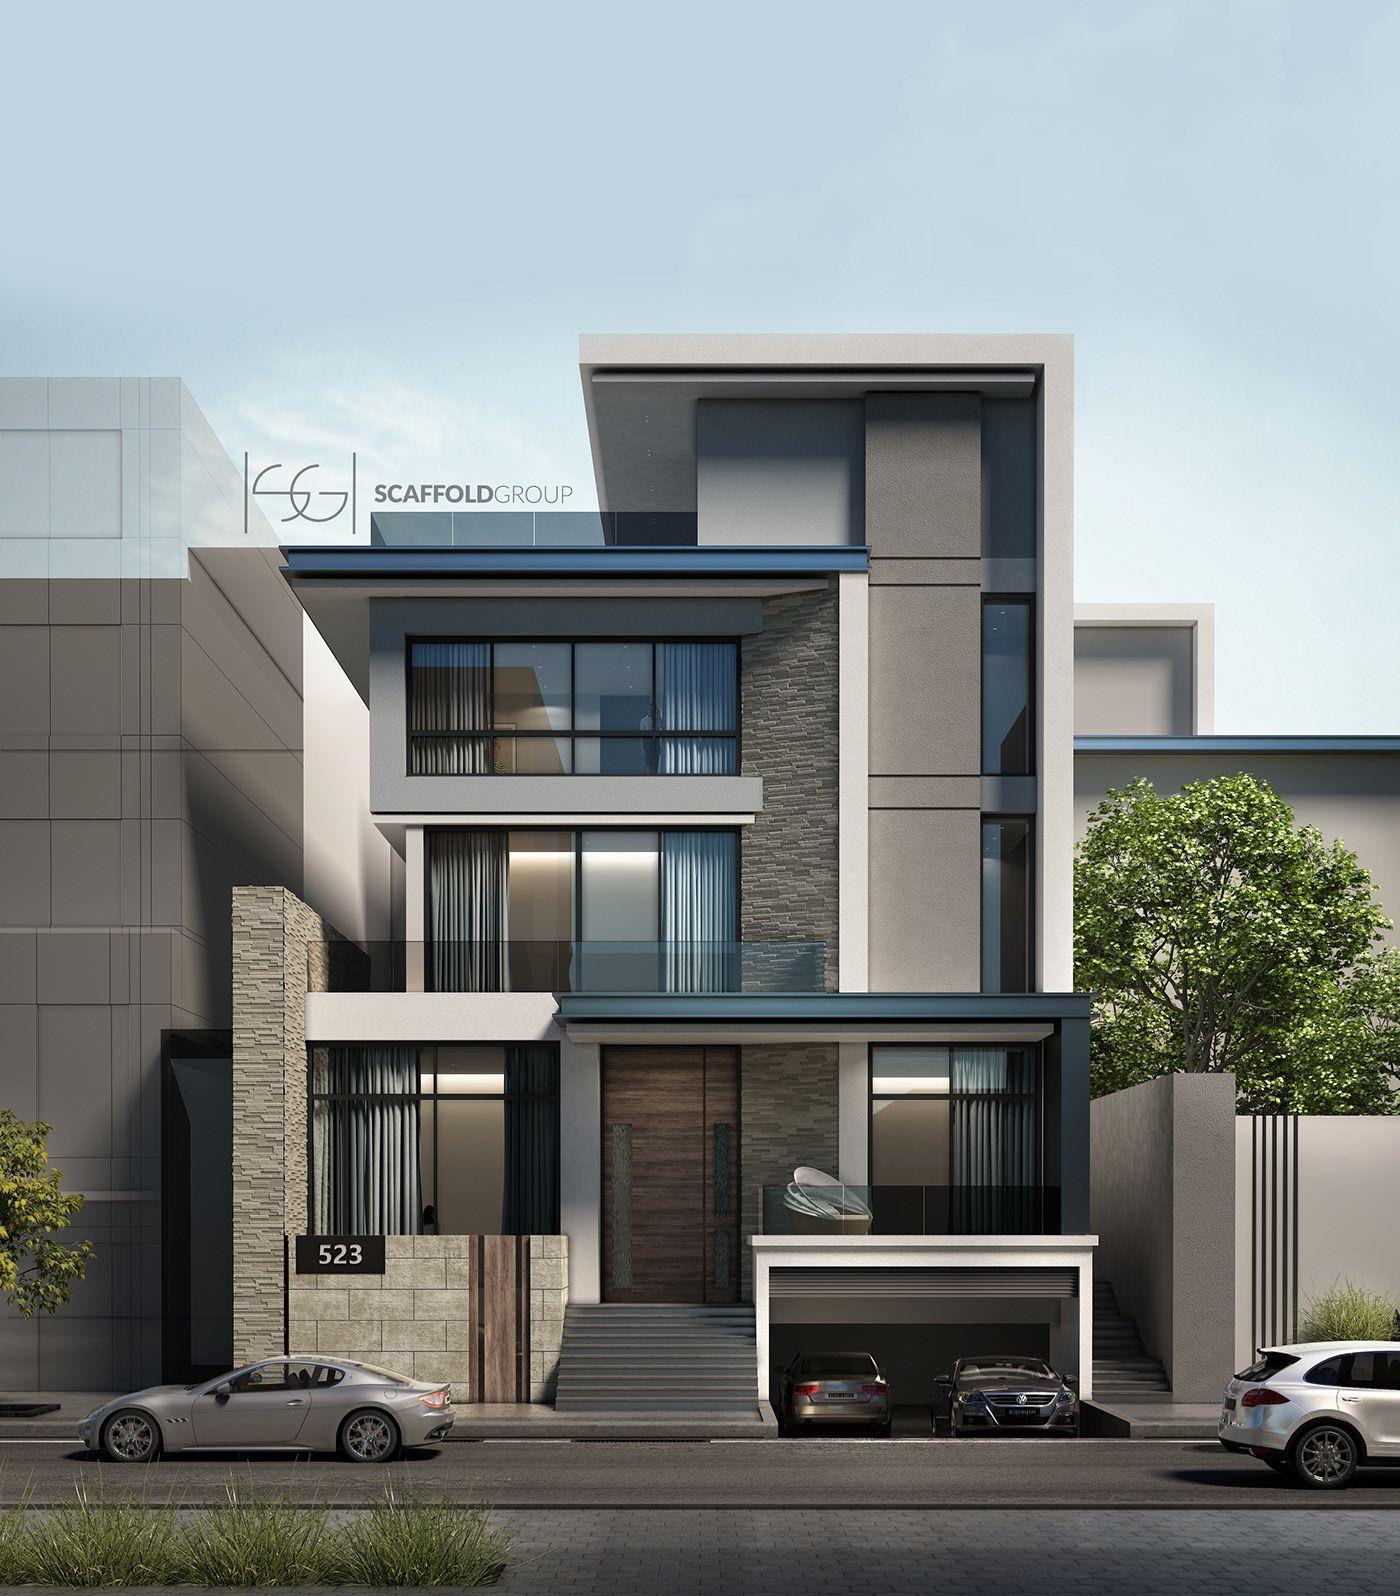 Pin By Abdulrahman Alkhalifah On House Design Home Building Design Duplex House Design Bungalow House Design